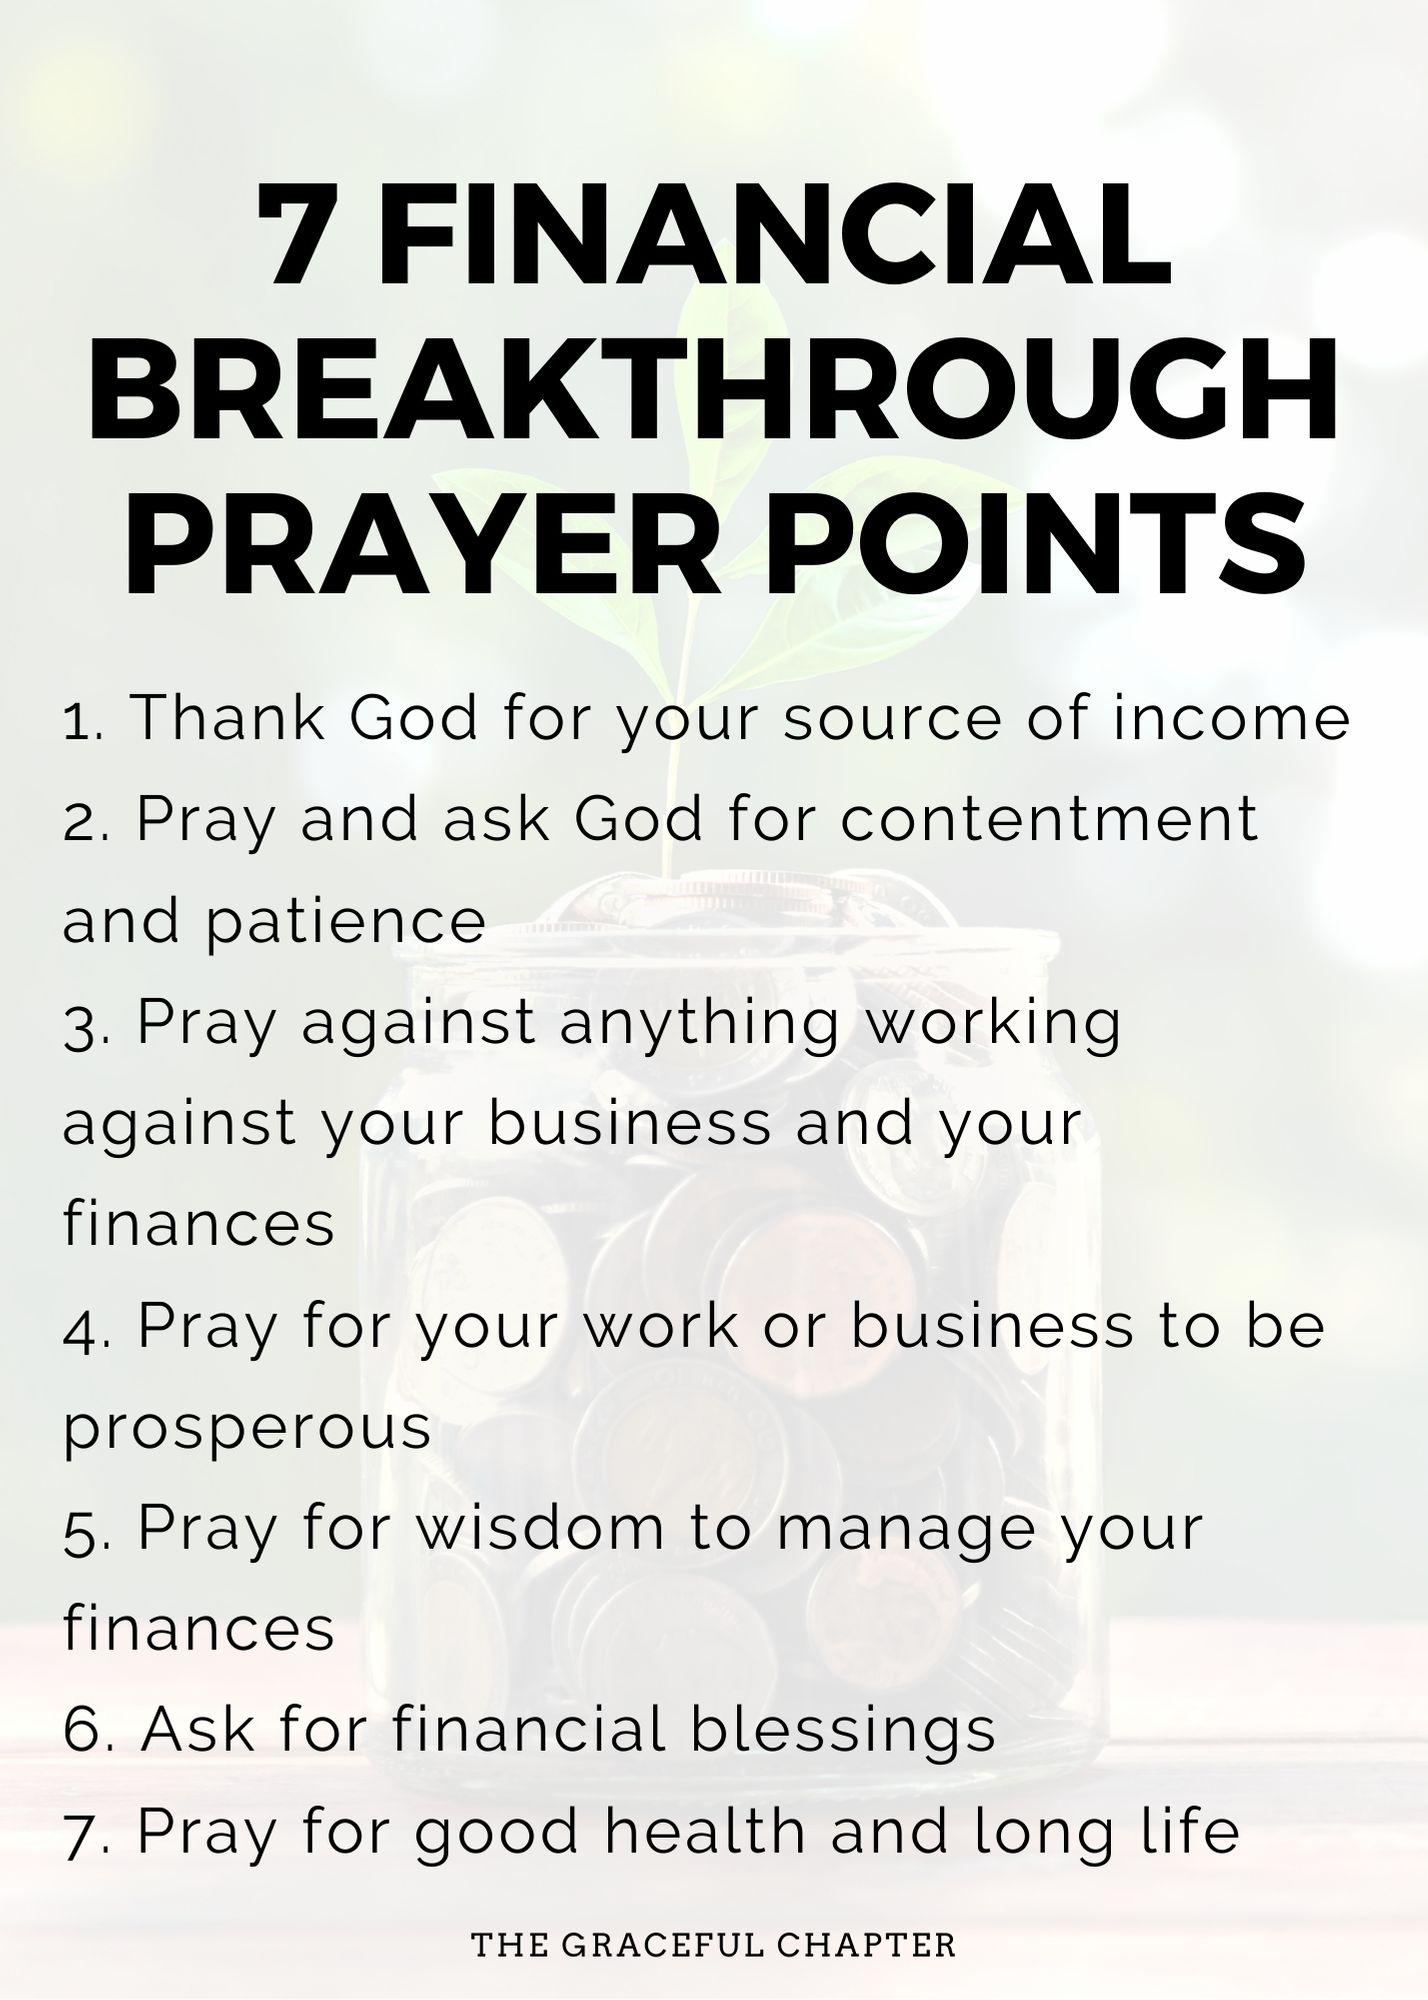 Financial breakthrough prayer points